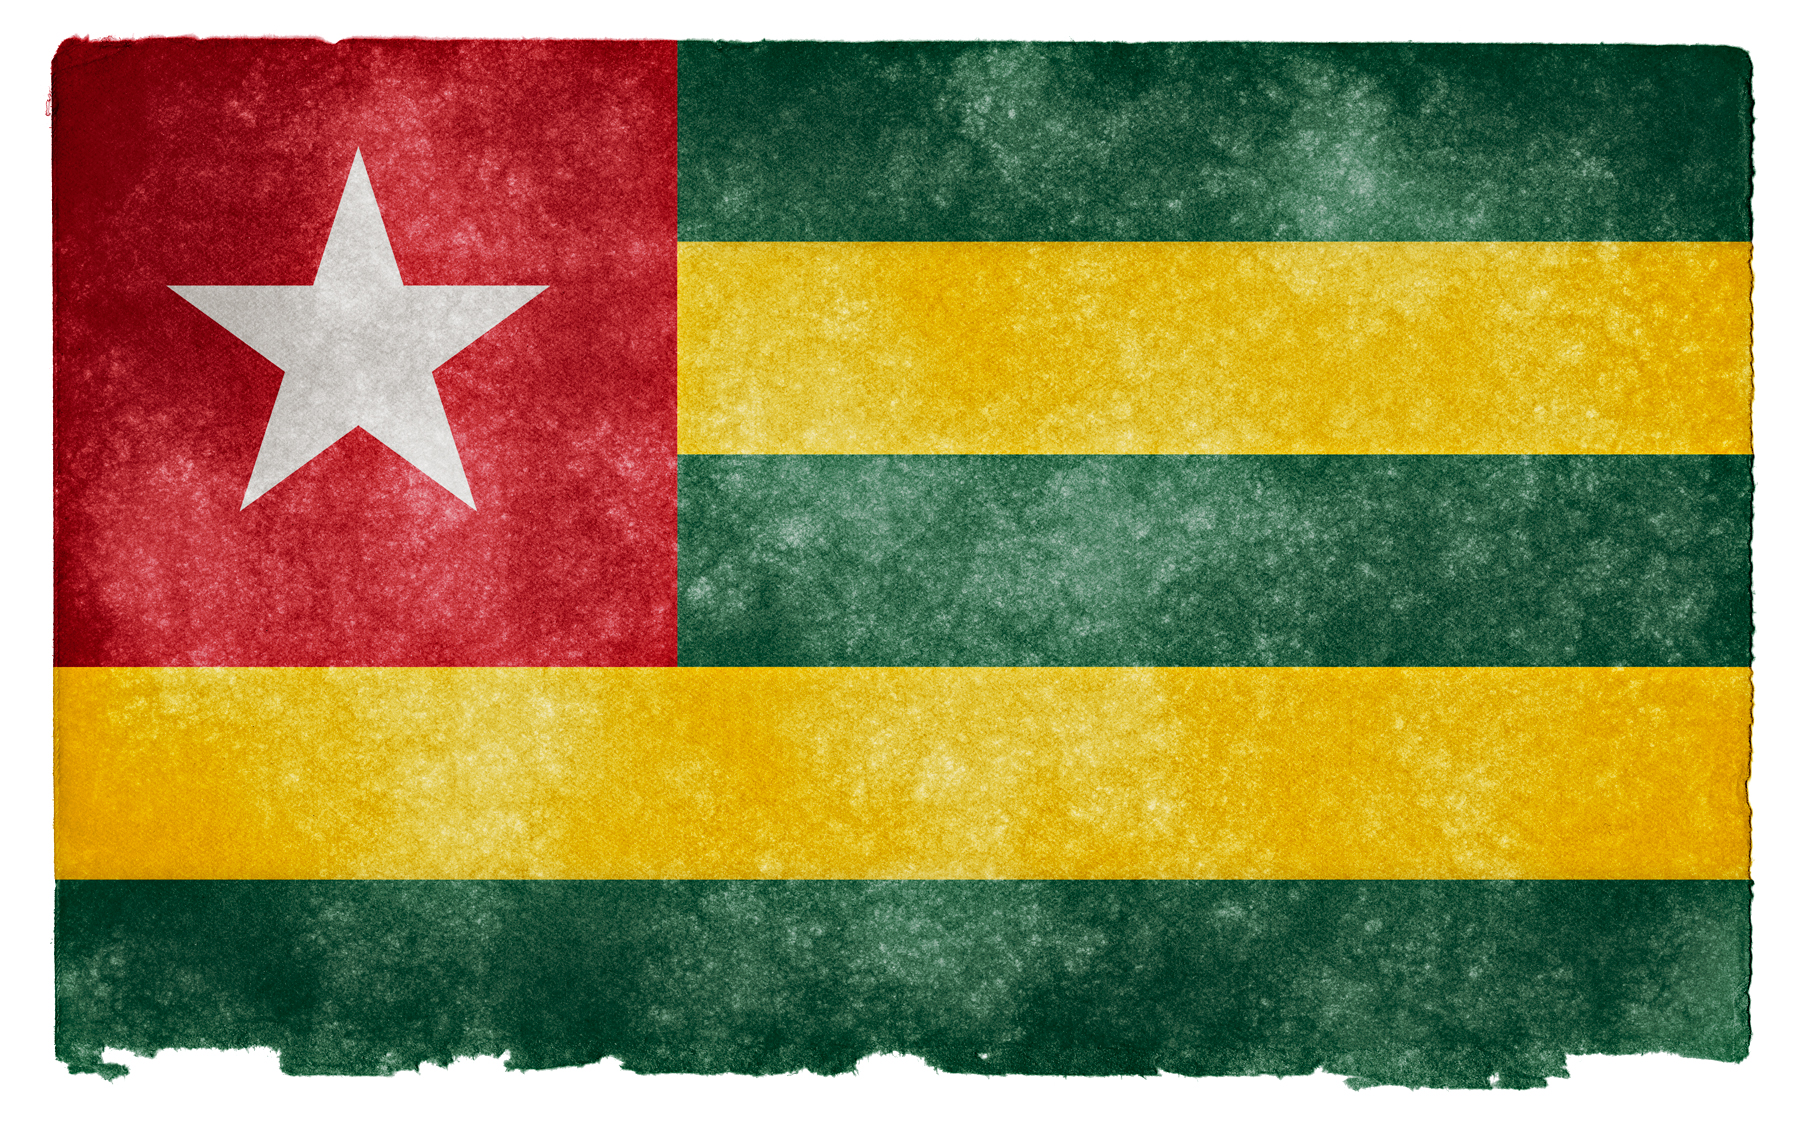 Togo Grunge Flag, Africa, Somadjinn, Paper, Parchment, HQ Photo